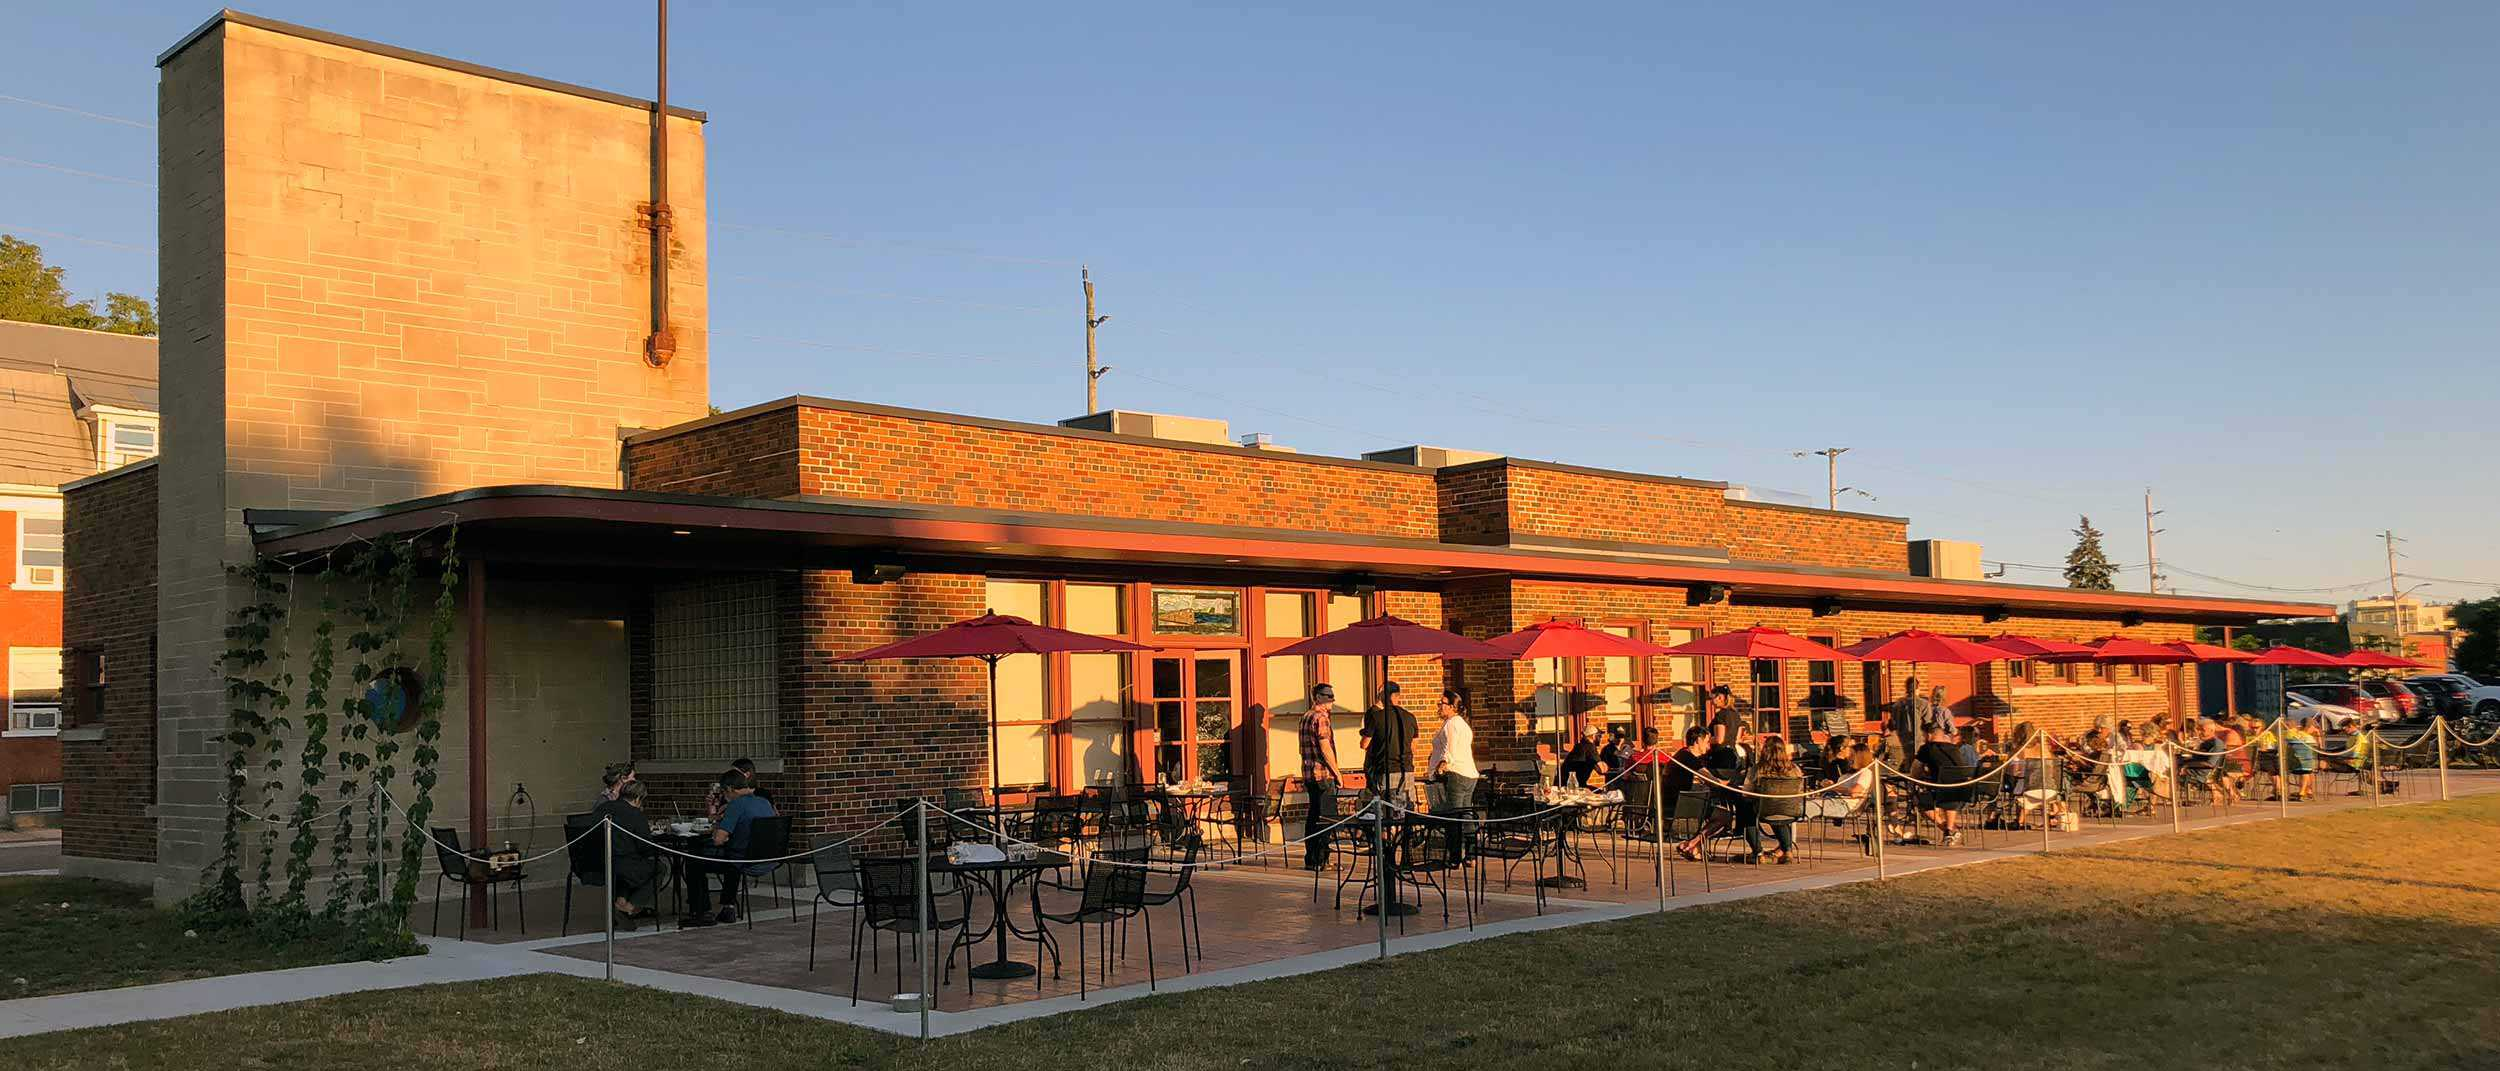 Mudtown Station Brewery and Restaurant